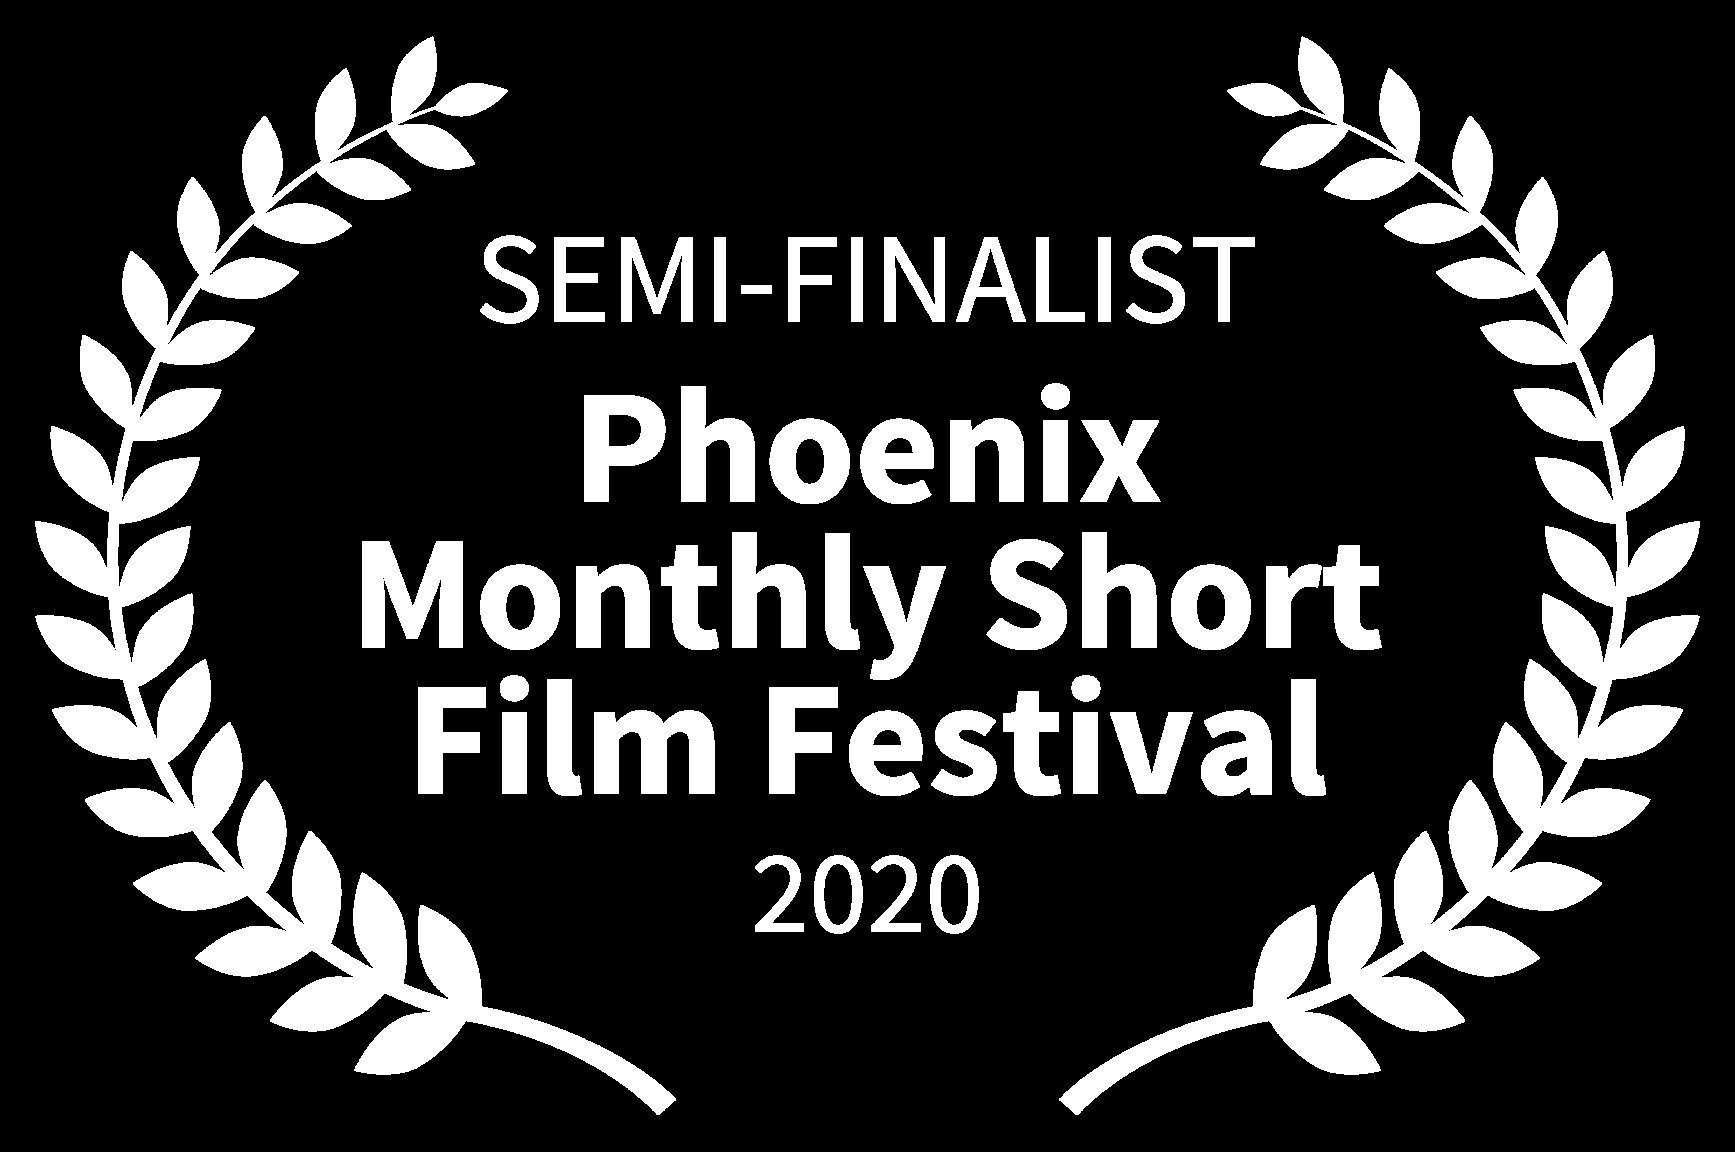 SEMI-FINALIST - Phoenix Monthly Short Film Festival - 2020